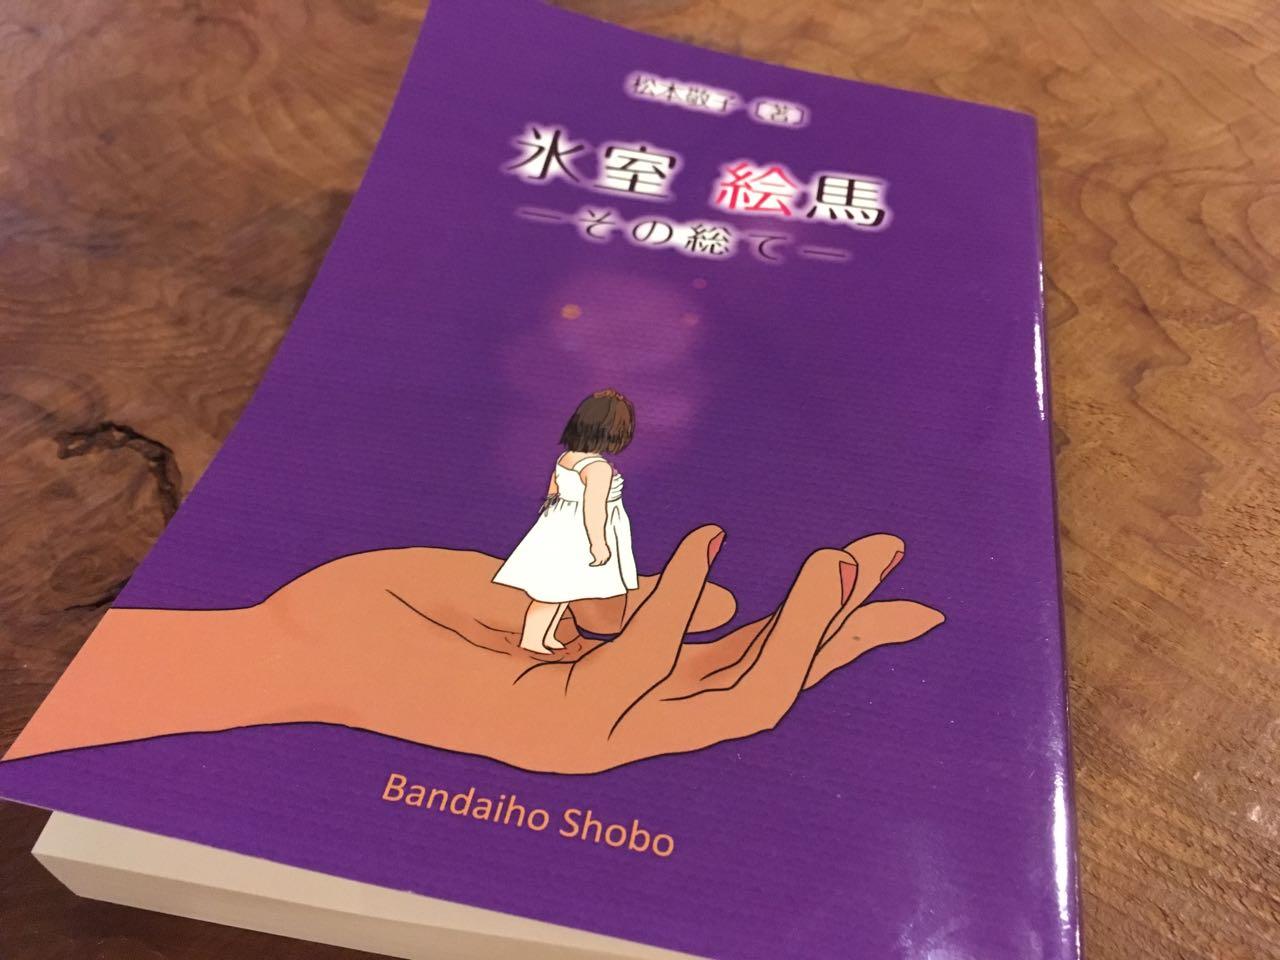 ehime,imabari,みとん今治,今治,小説,愛媛,松本敬子,氷室絵馬